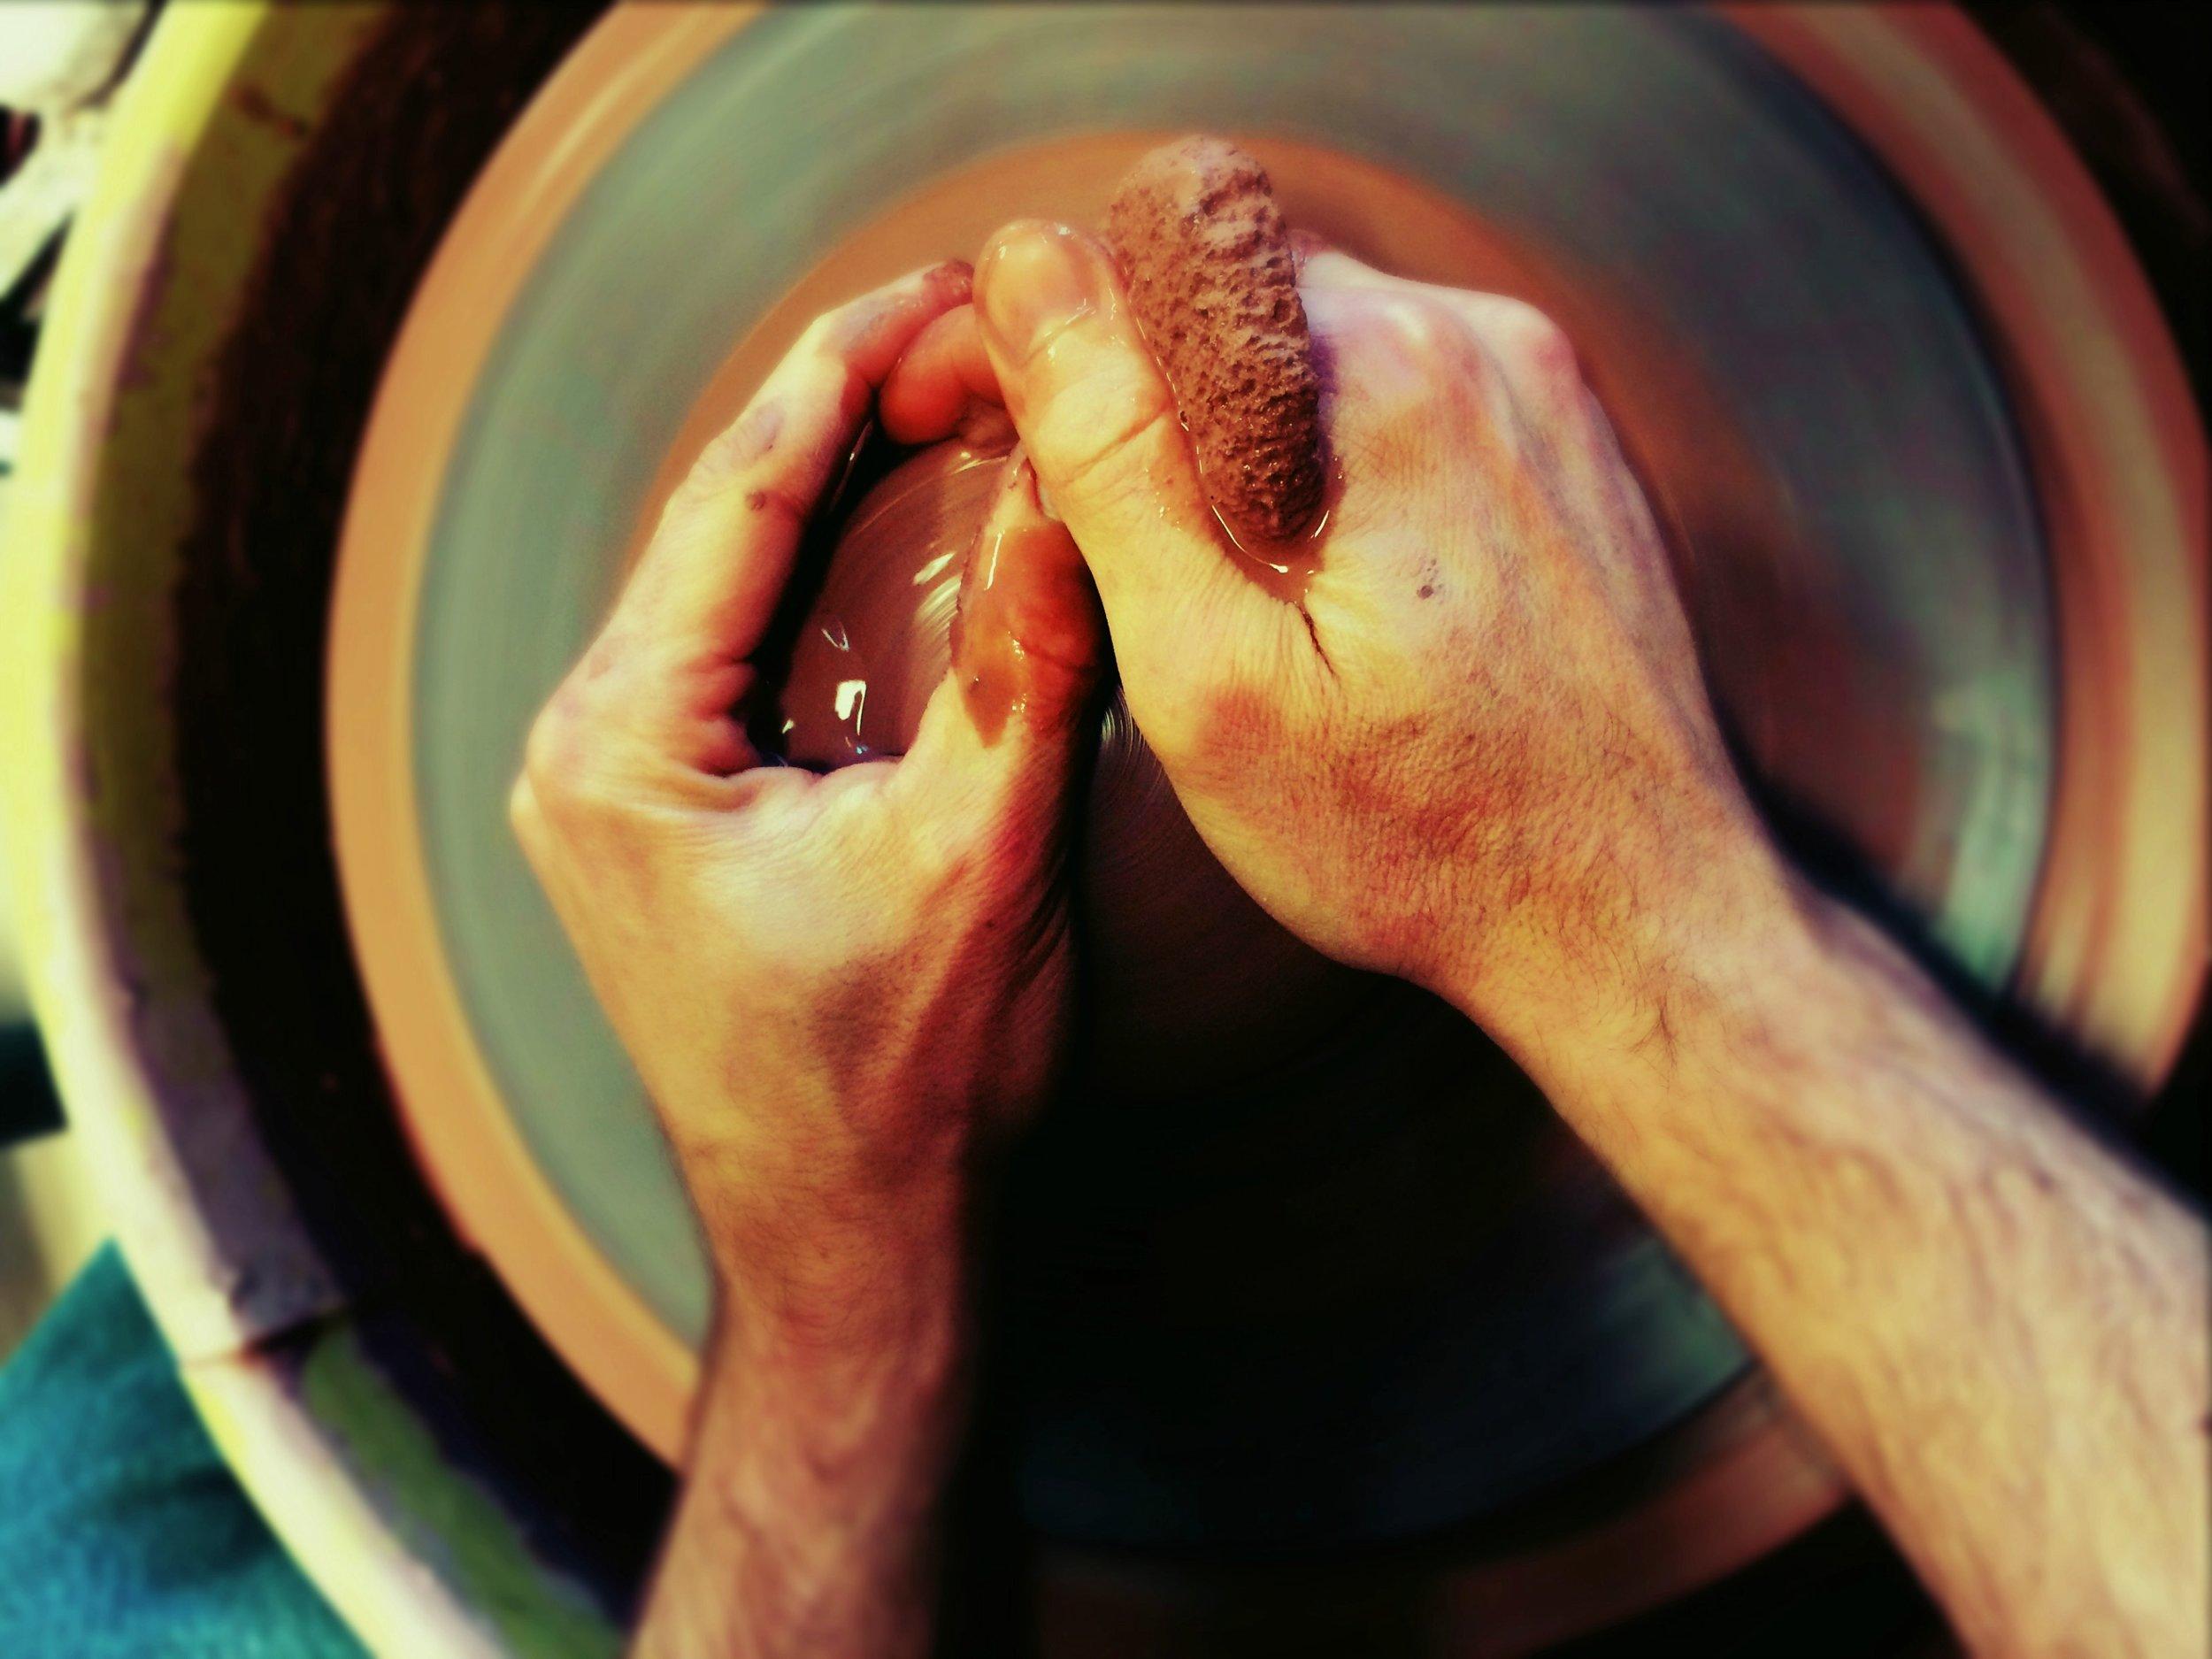 rob hand centering blur to bw fade.jpg